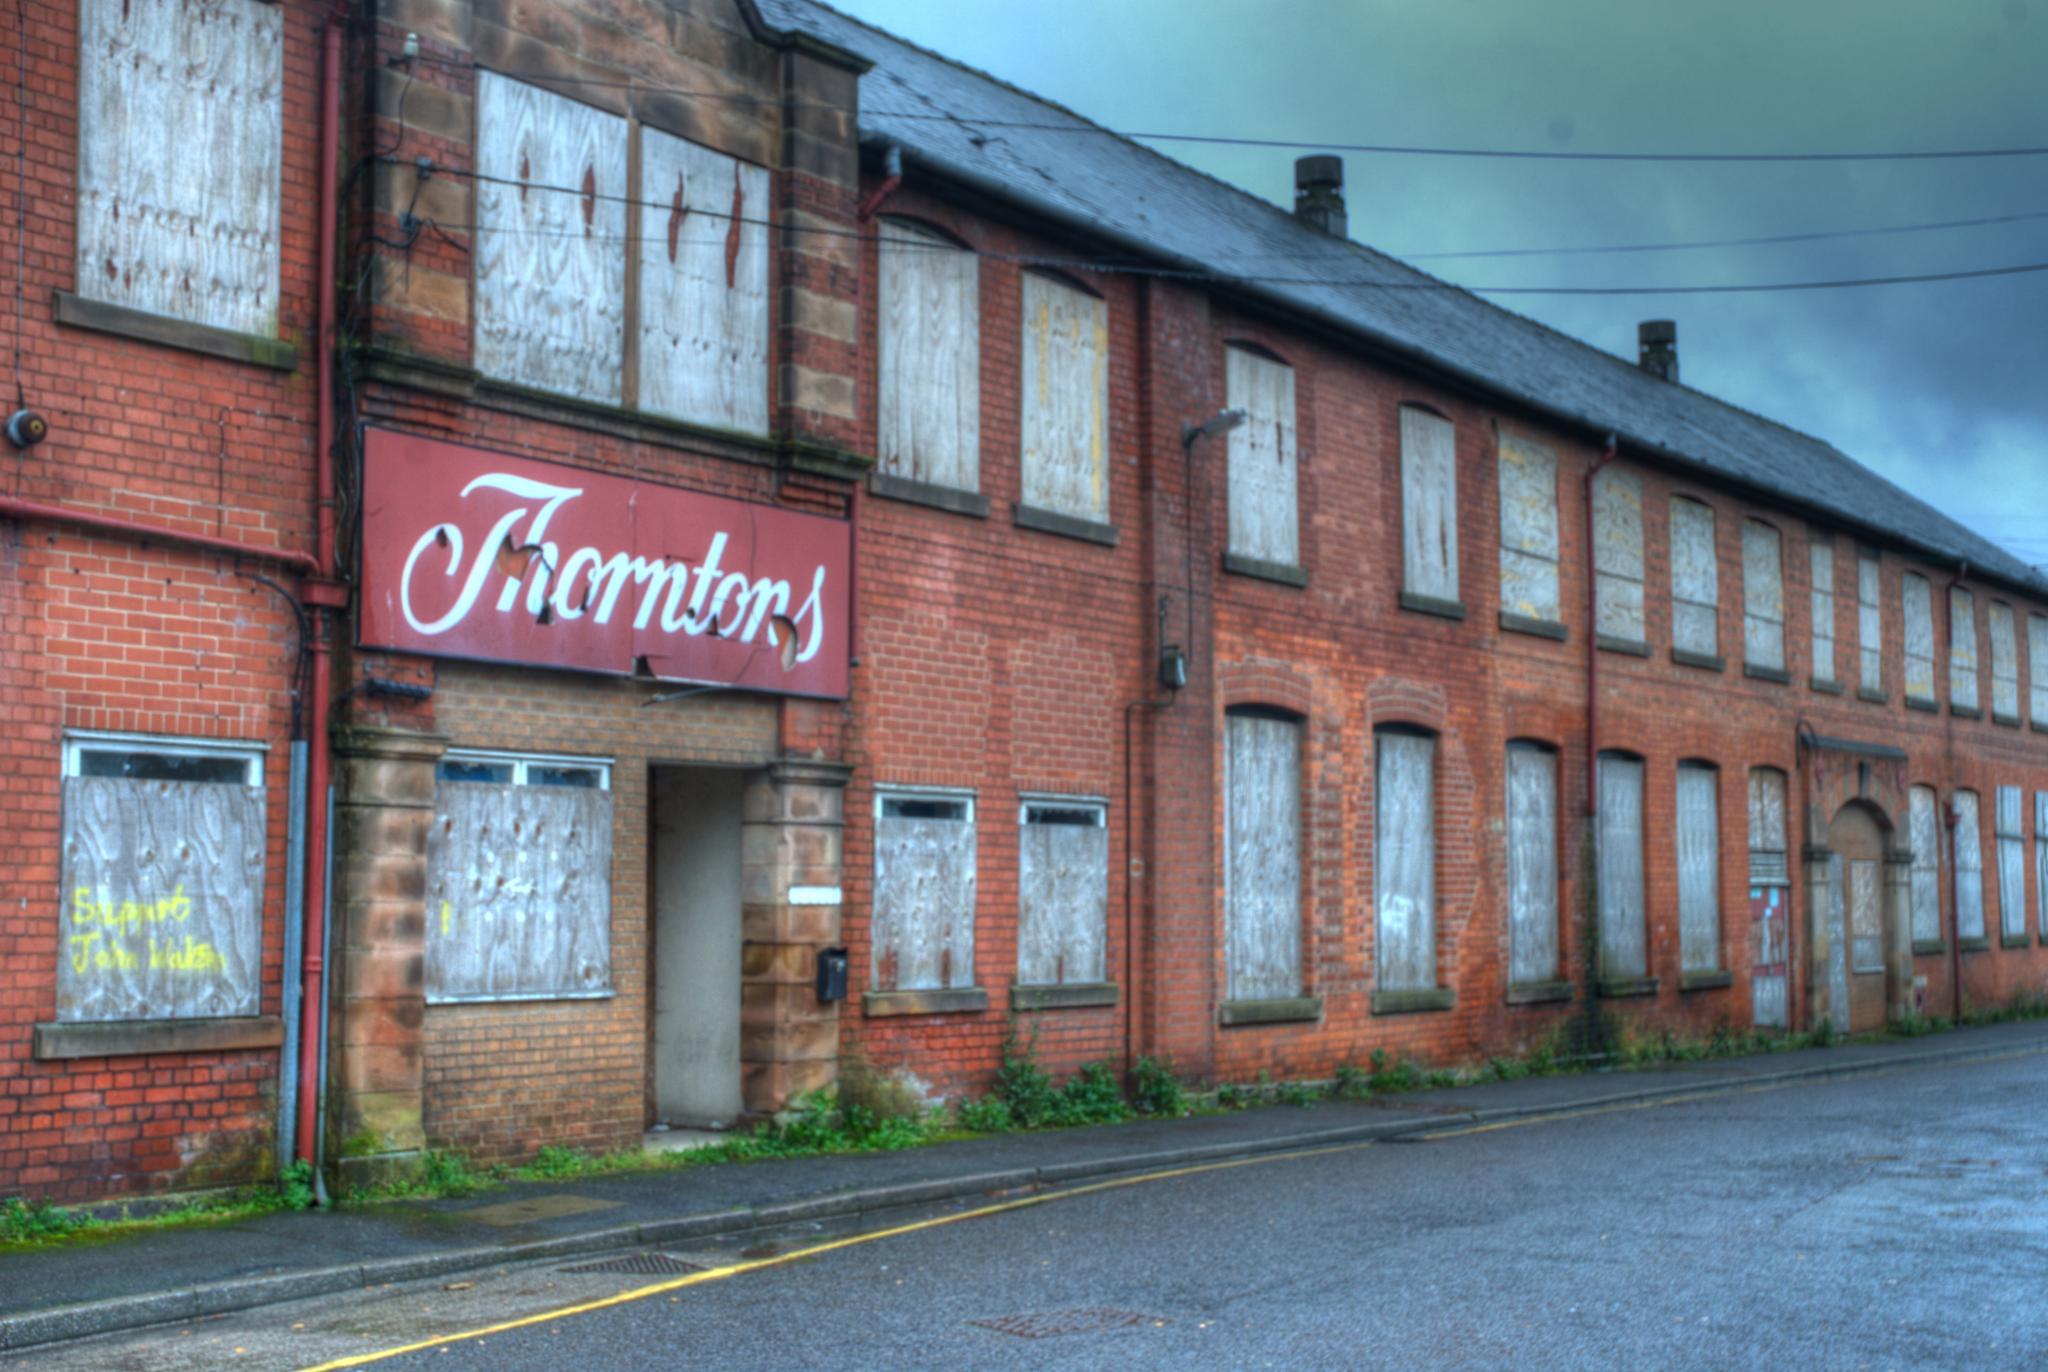 Thorntons Factory by KSurelia